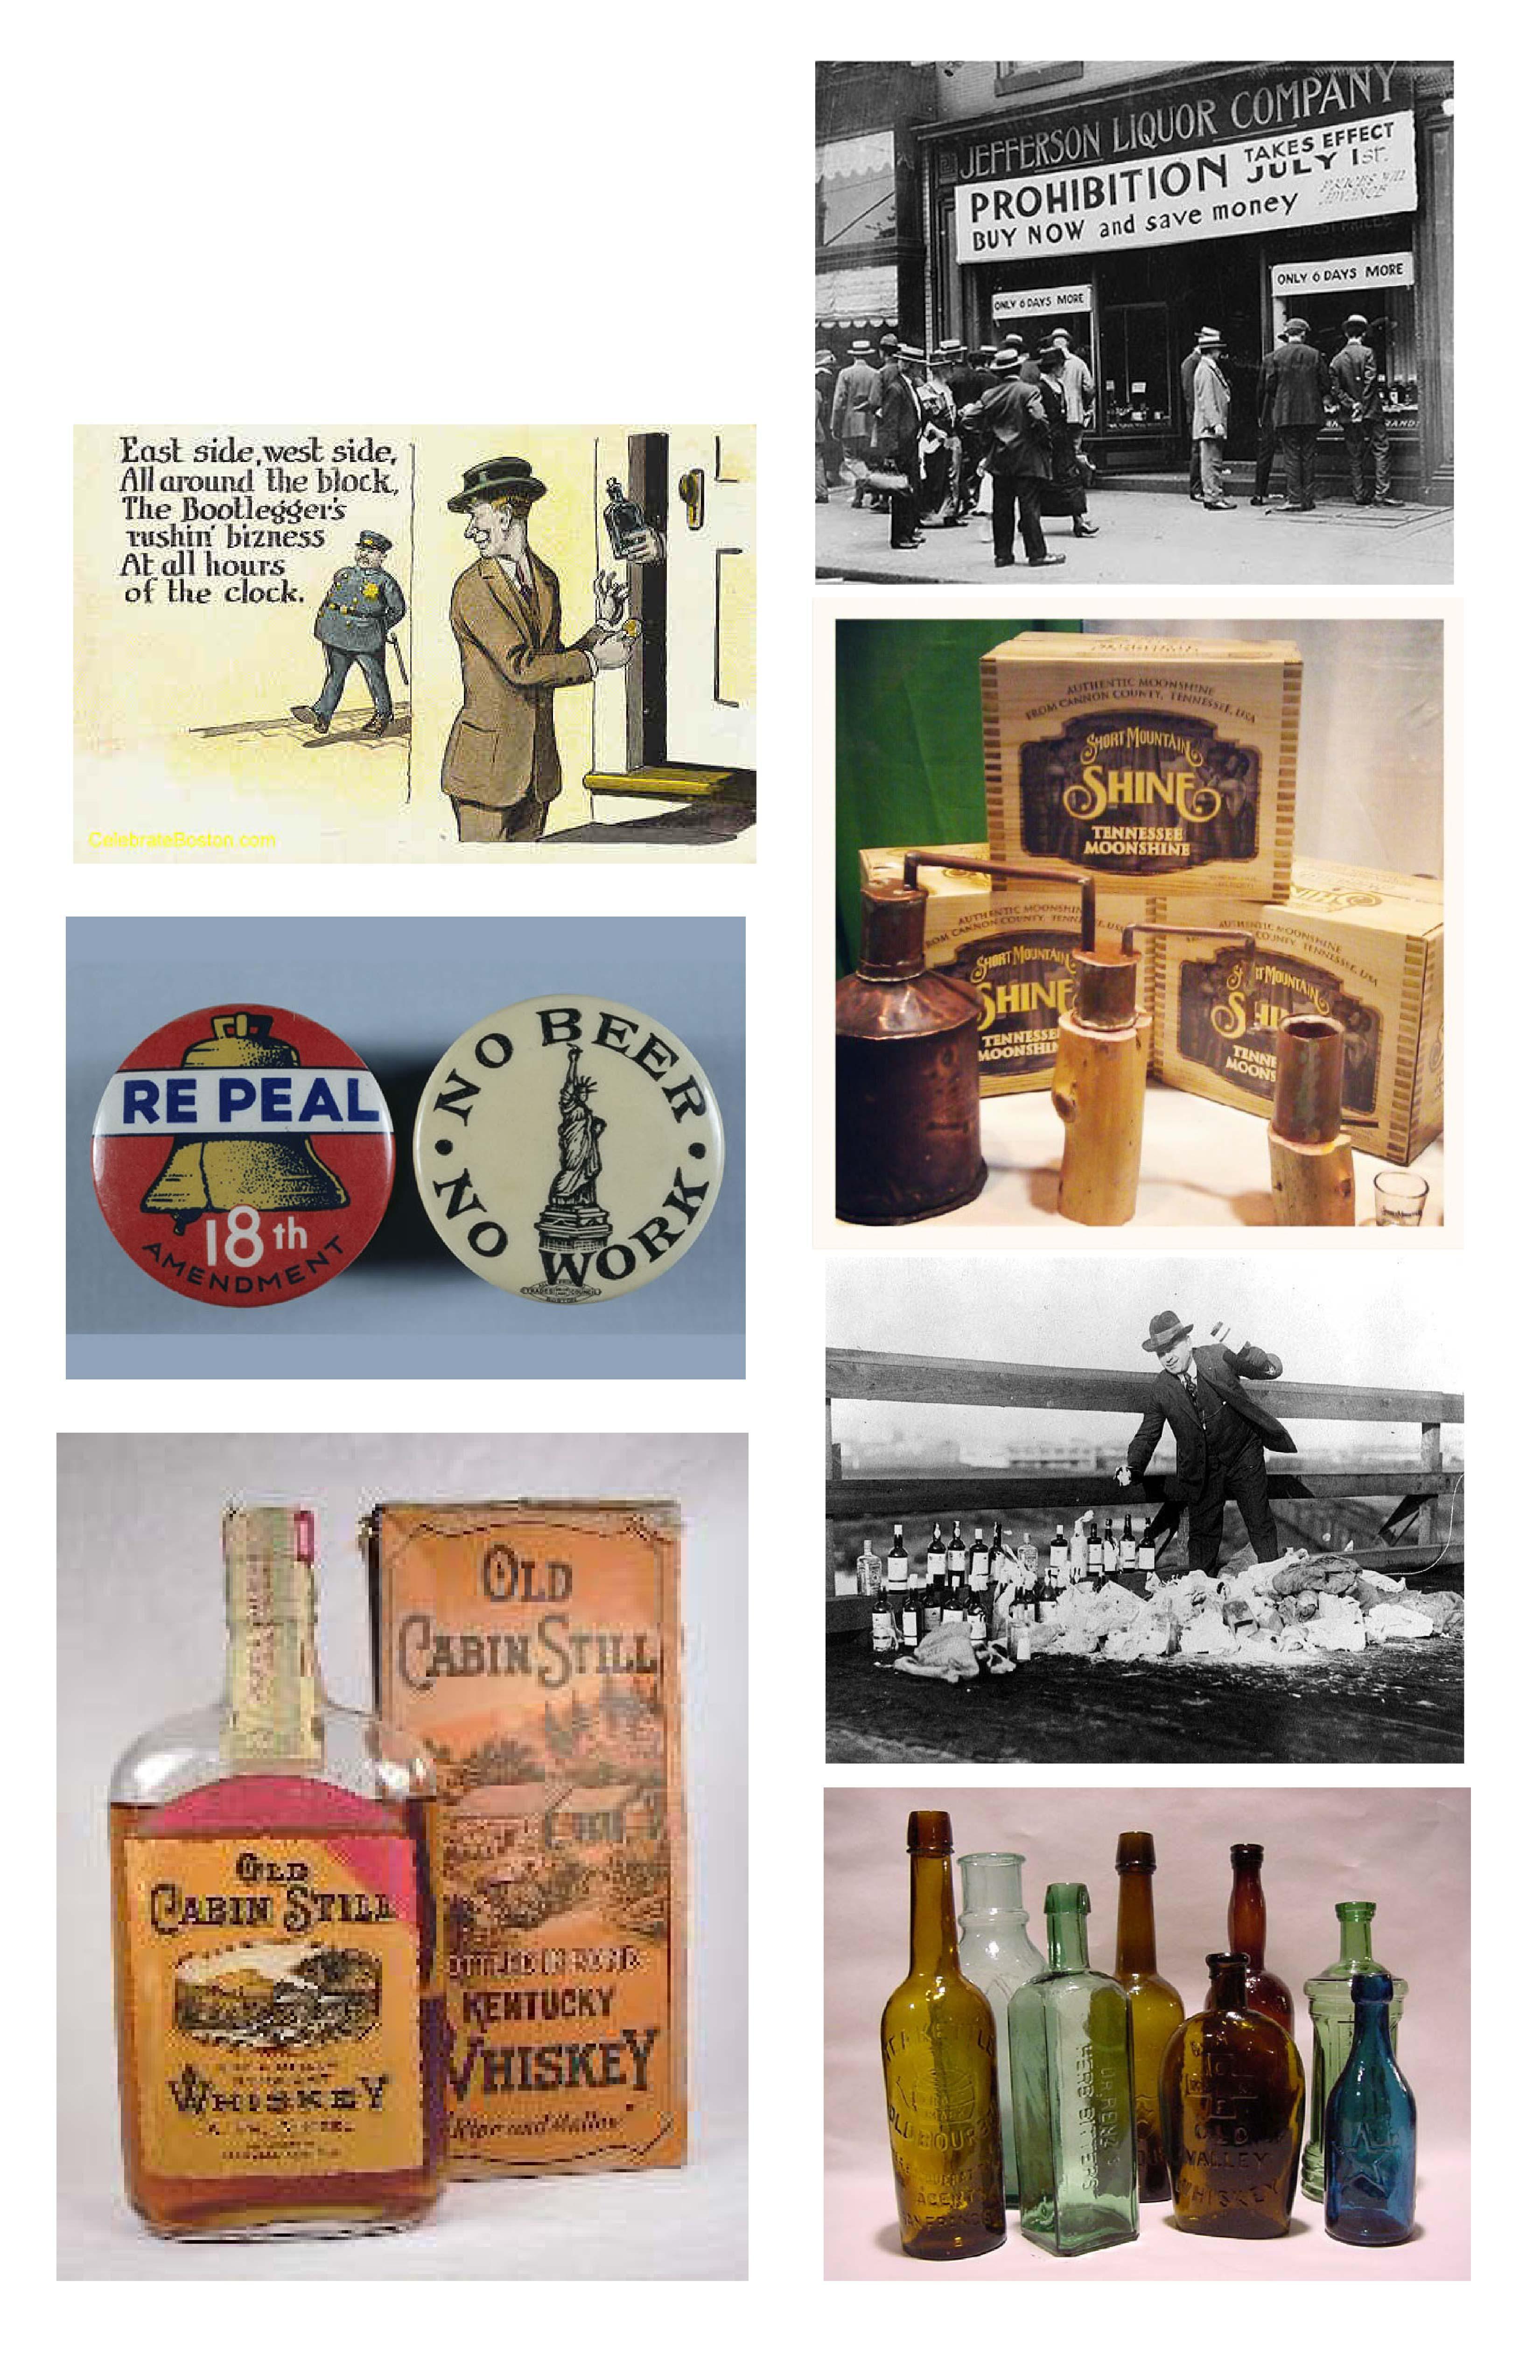 Hooch Moonlight Whiskey - image 4 - student project